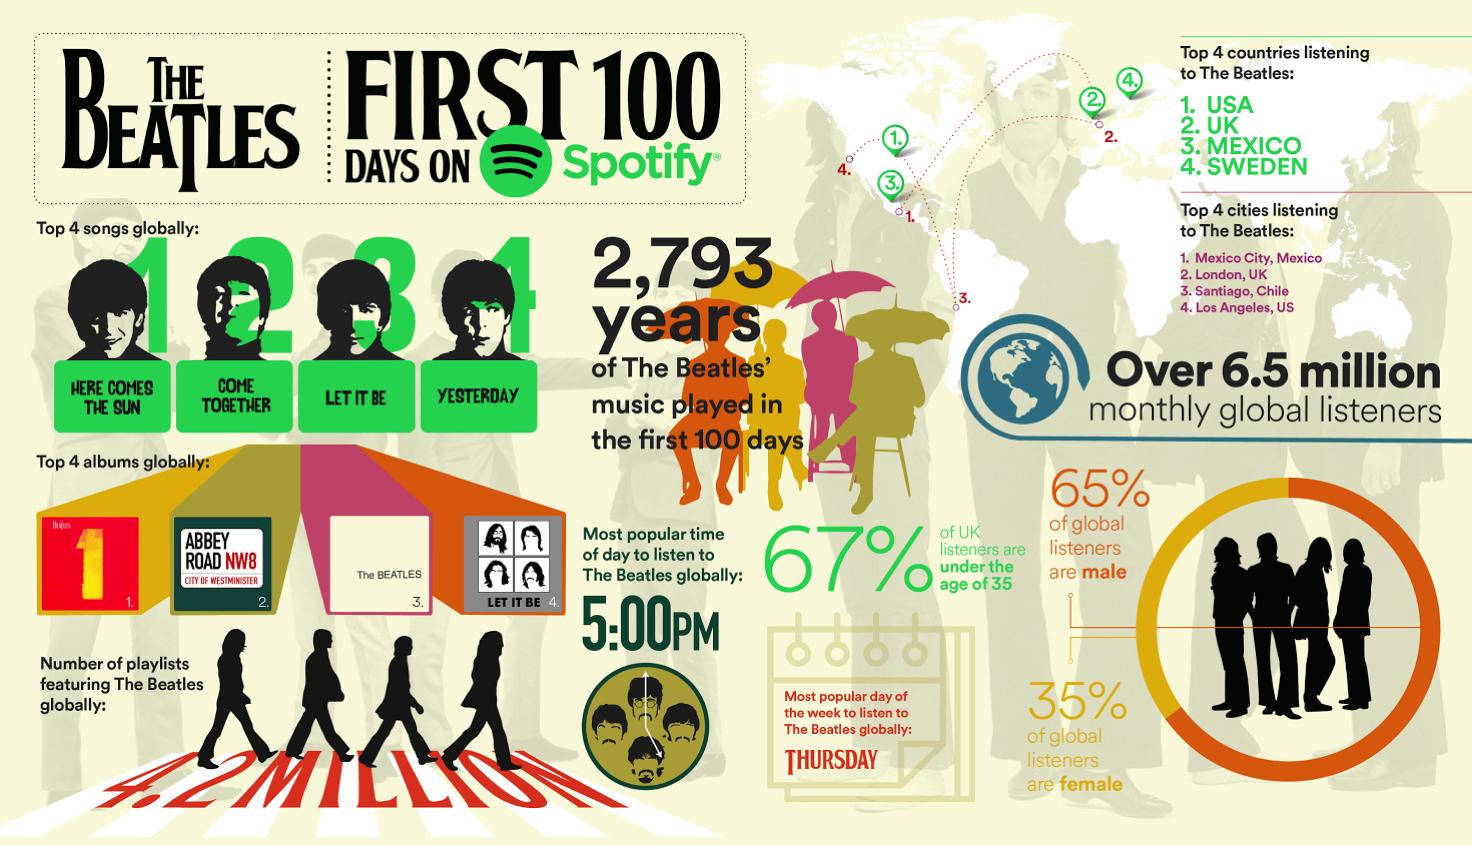 The Beatles Polska: Pierwsze 100 dni muzyki The Beatles na Spotify